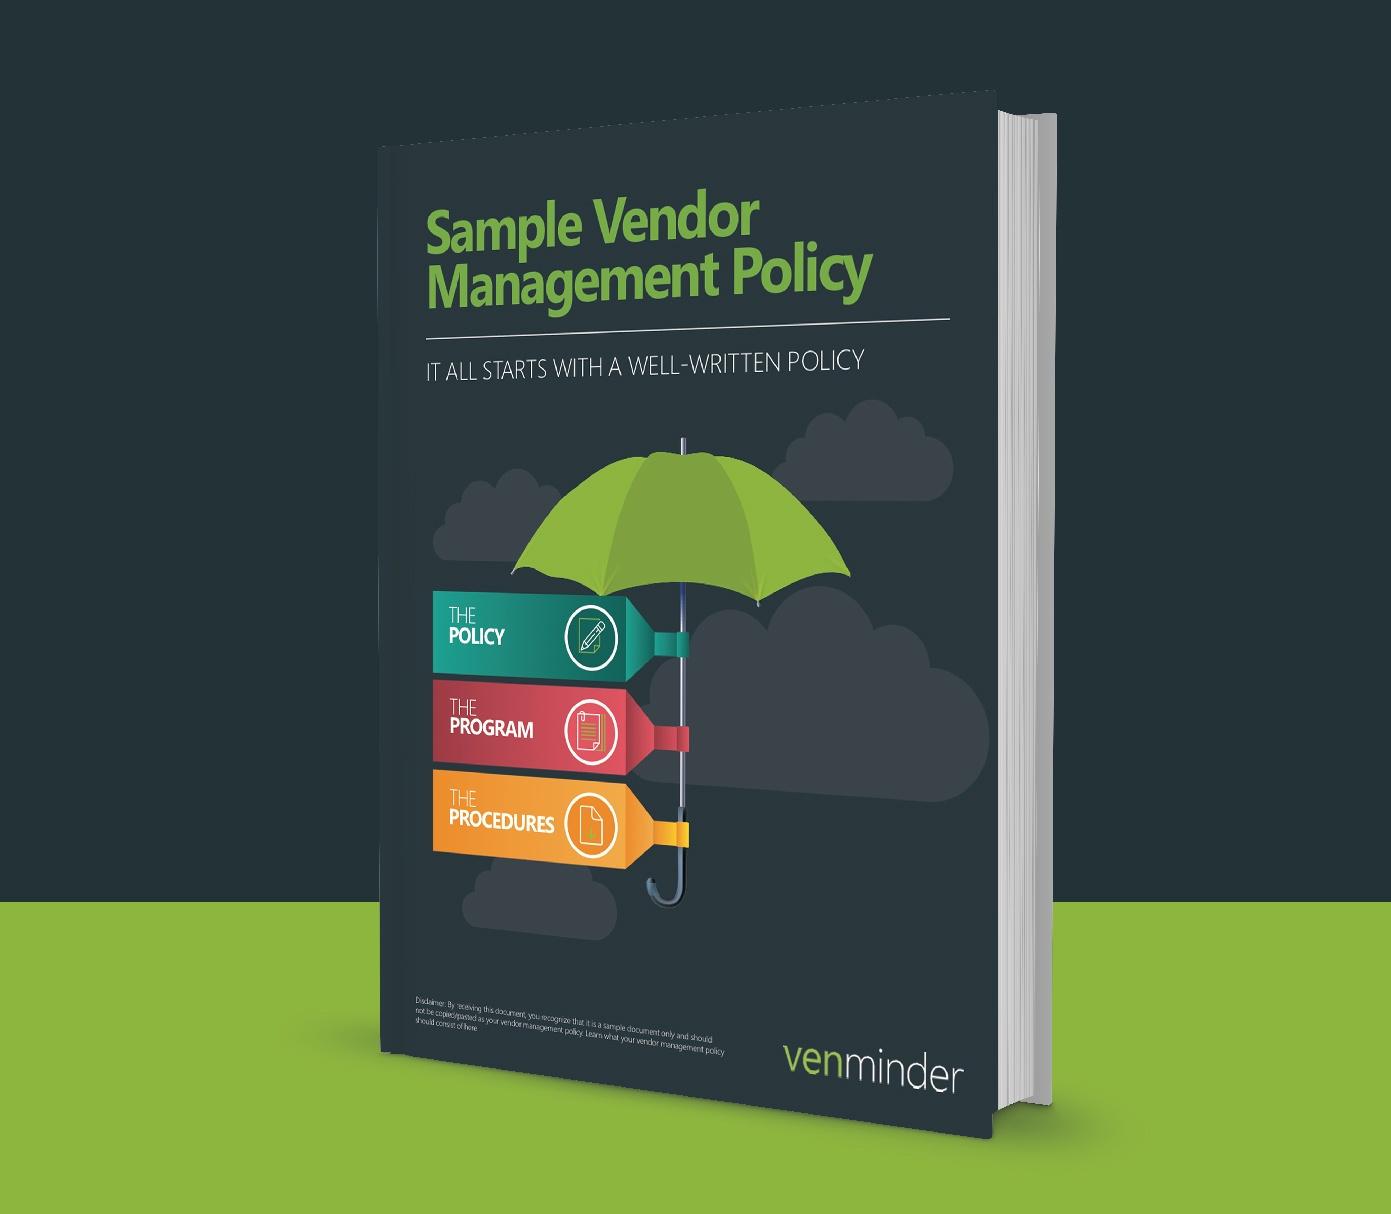 Sample Vendor Management Policy